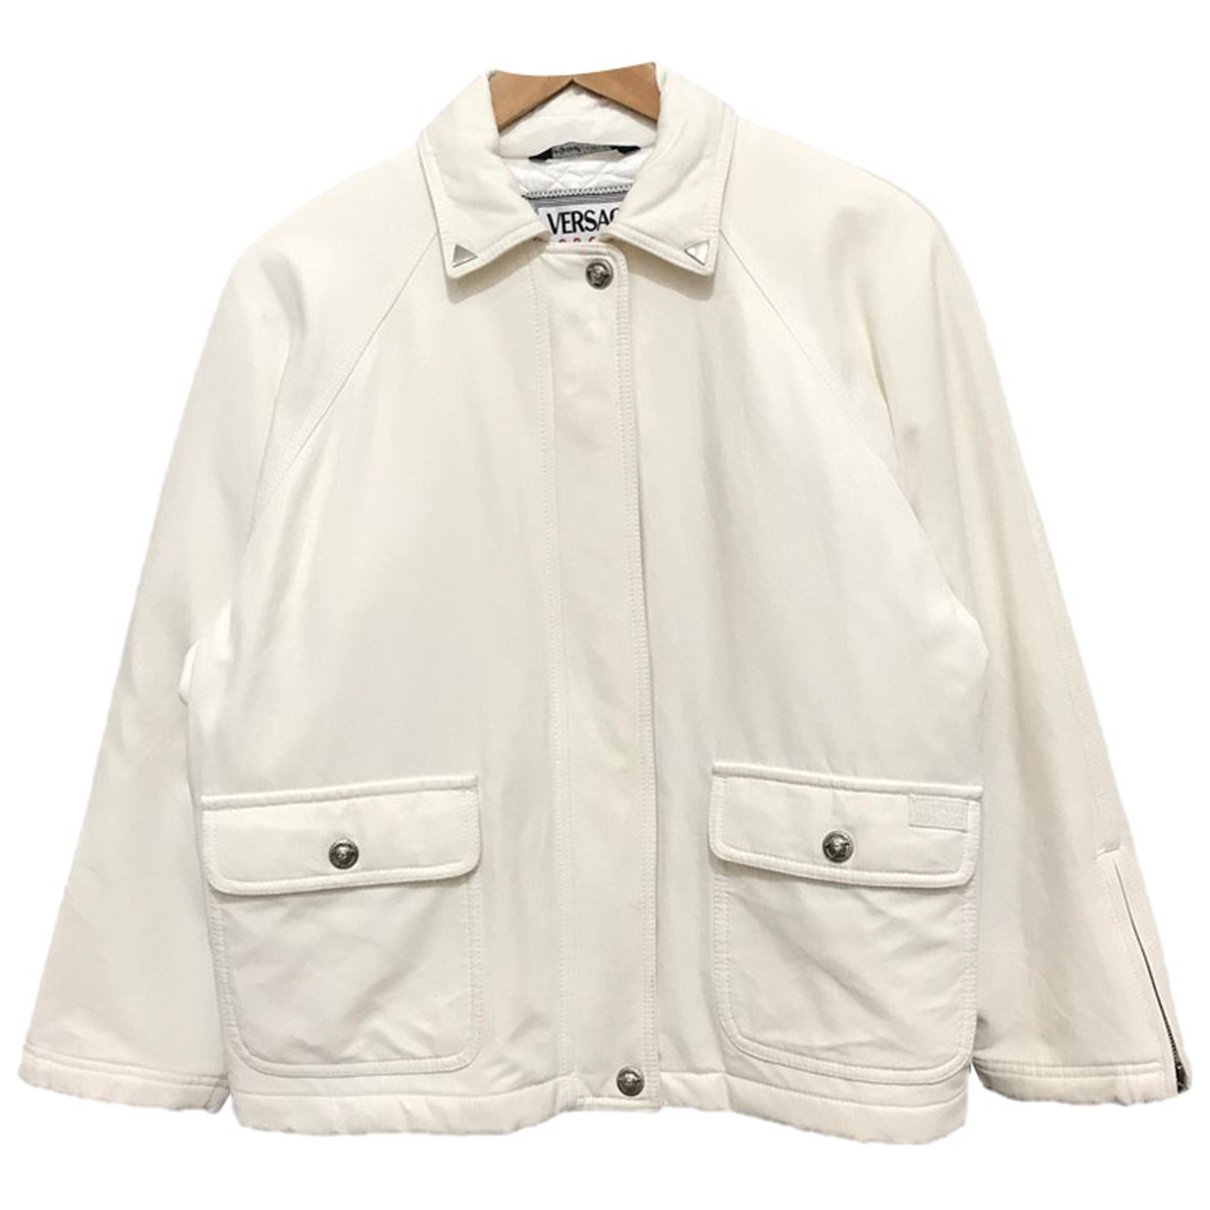 Versace Jeans \N White jacket  for Men M International